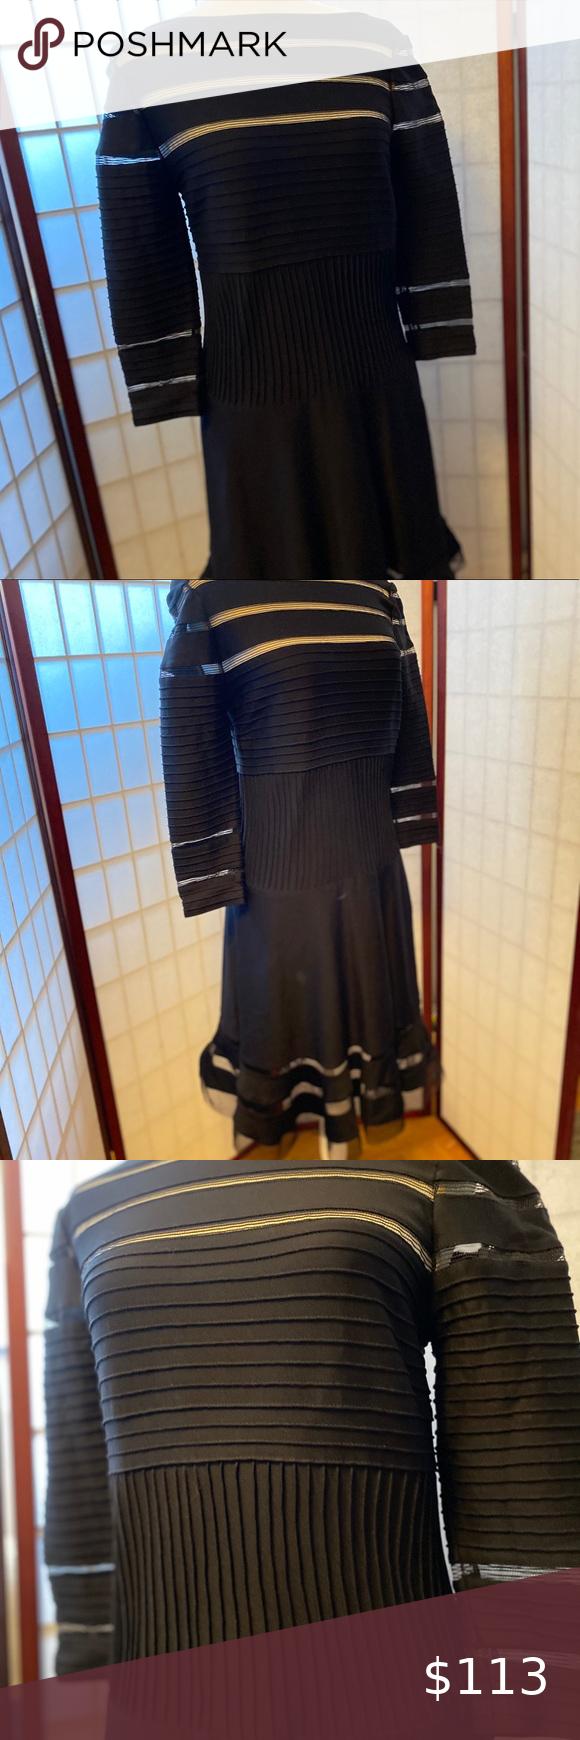 Tadashi Shoji Tiered Black Dress Black Tiered Dress Cocktail Dress Lace Women S Evening Dresses [ 1740 x 580 Pixel ]